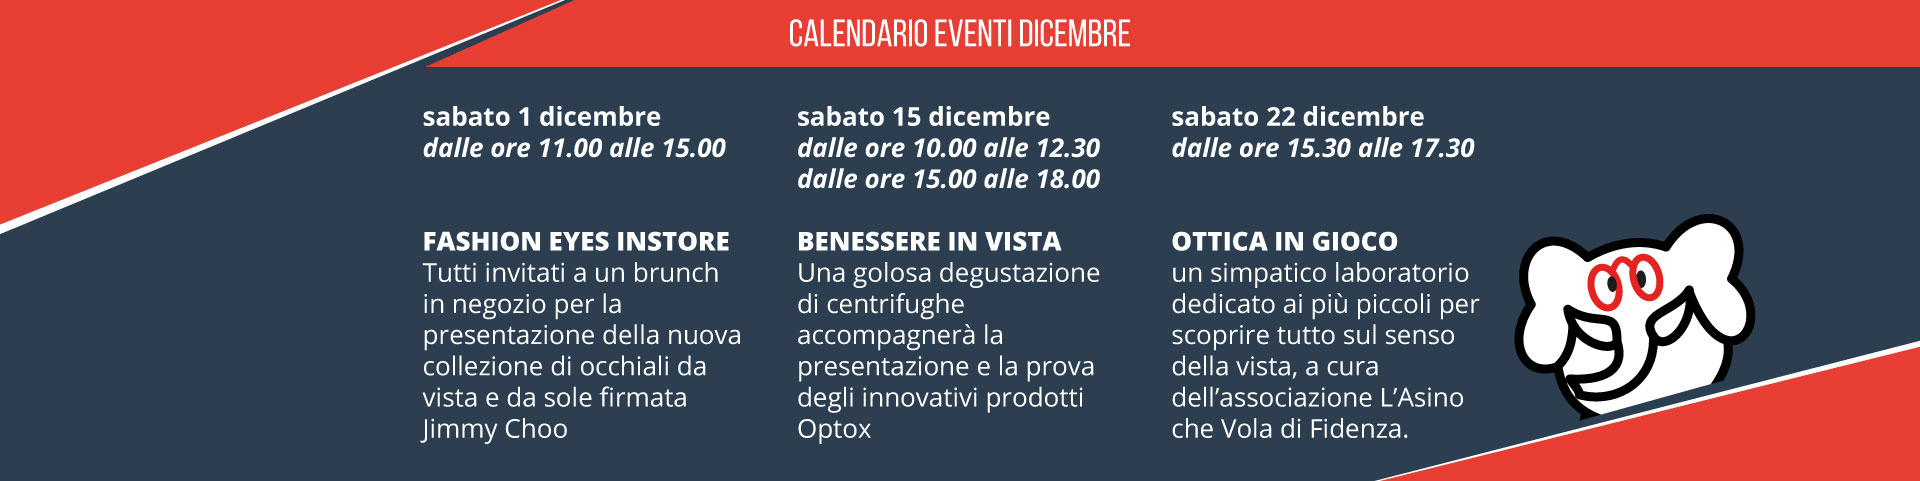 slide_calendario-